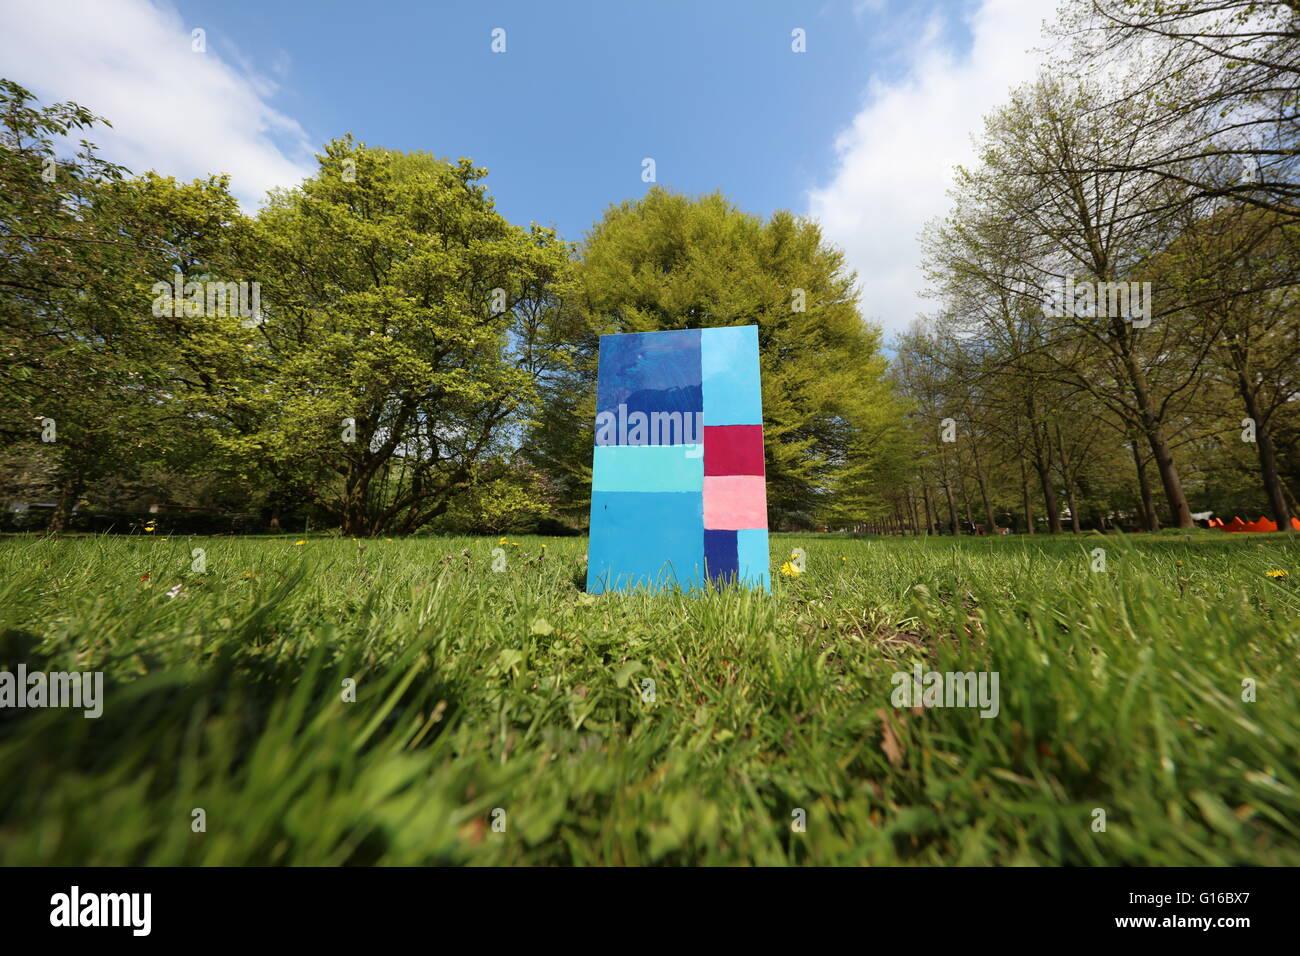 stammheim-schlosspark-cologne-germany-G1